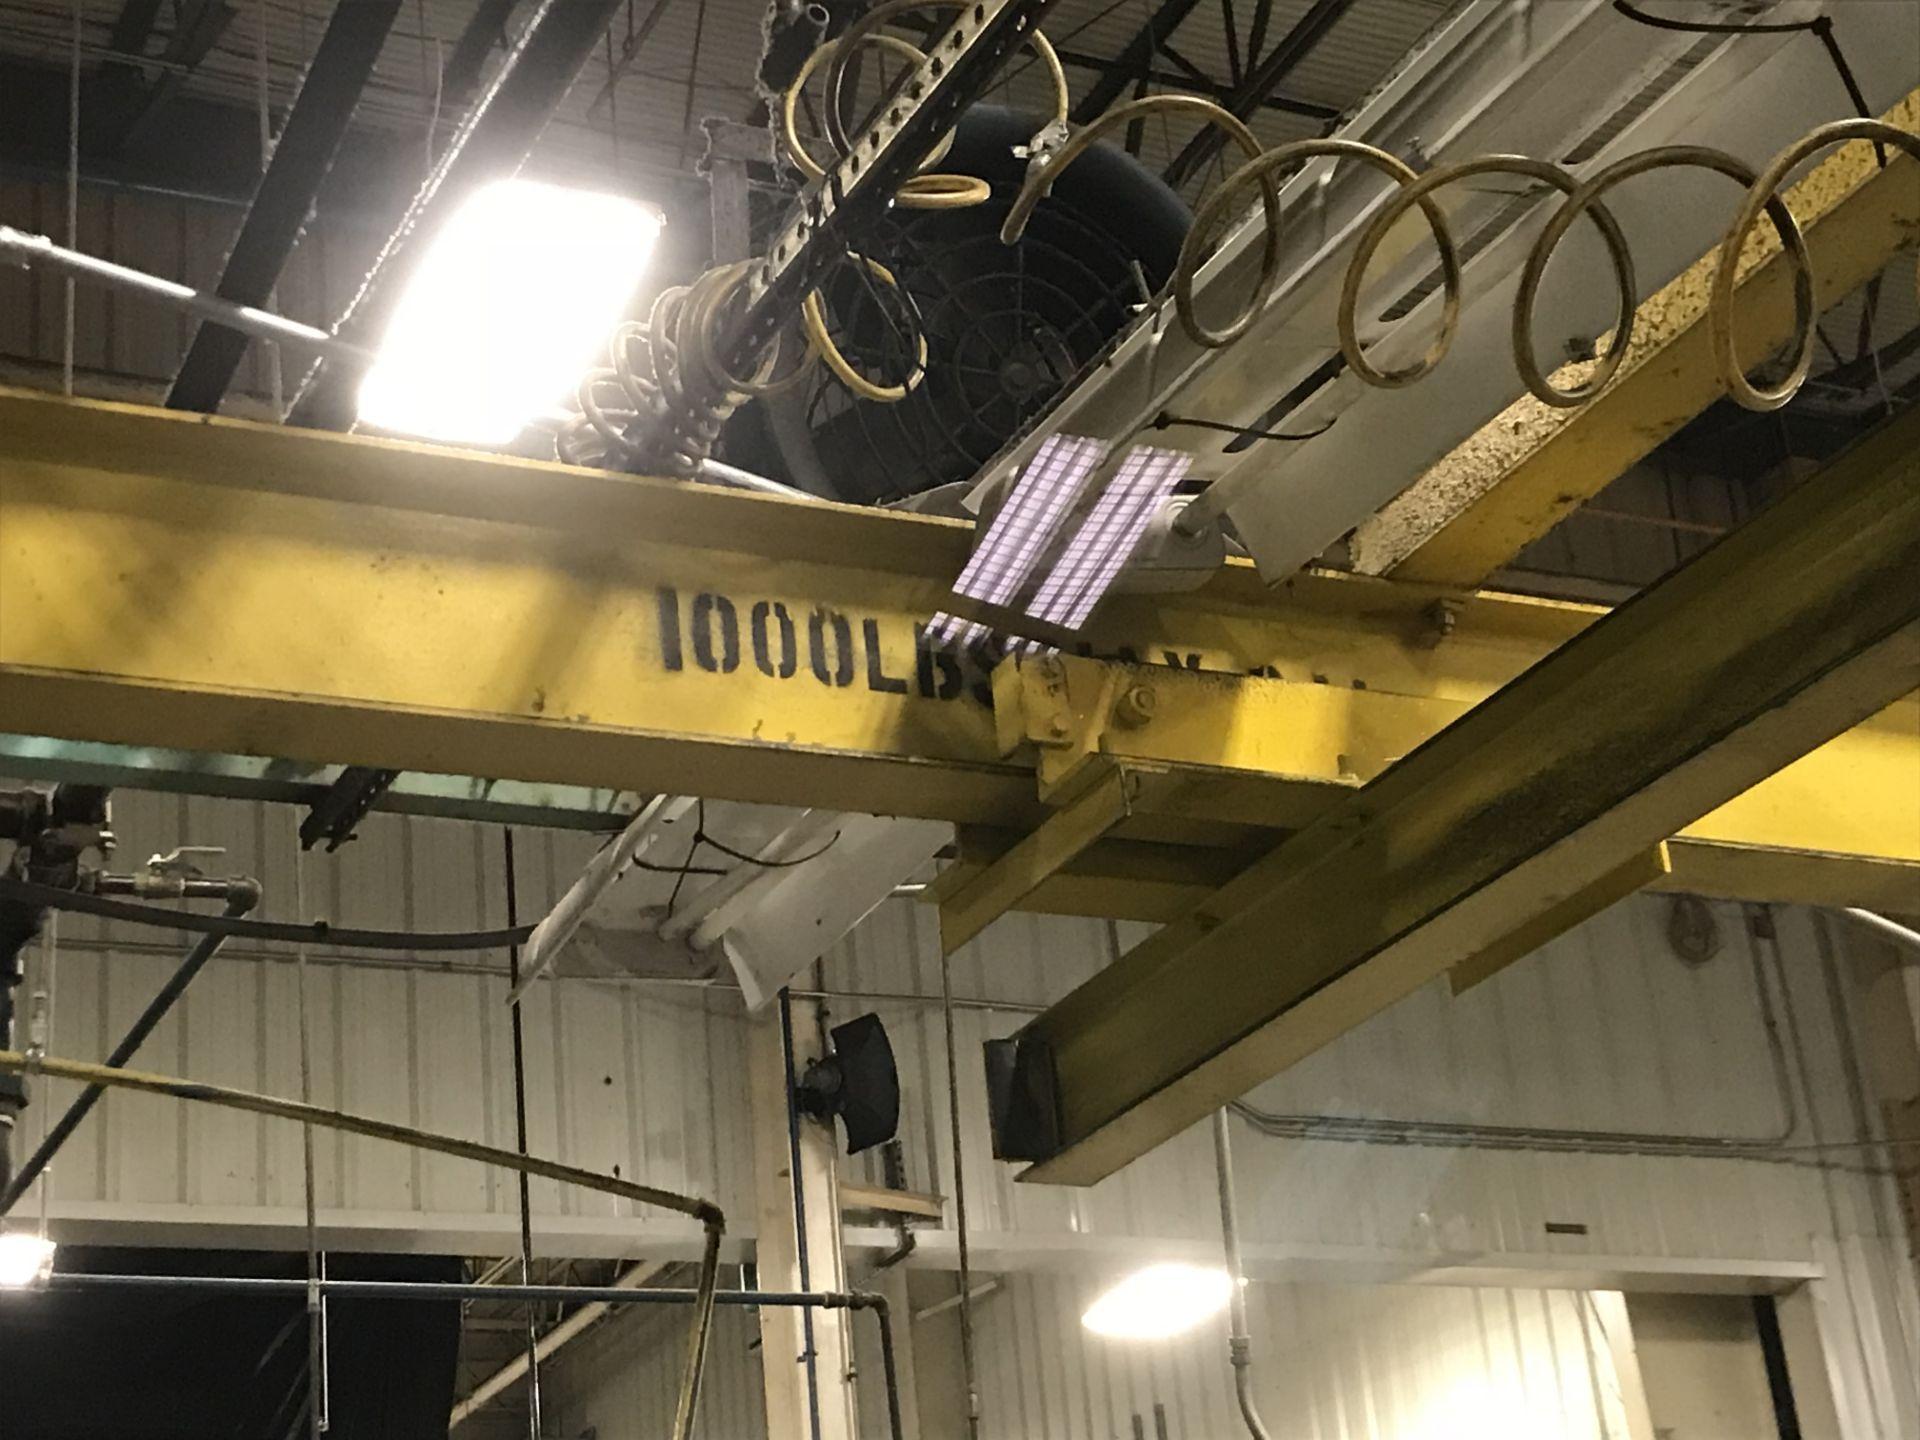 Lot 40 - 1000 lb Free Standing Bridge Crane (2) 500 lb Bridges w/ Hoist